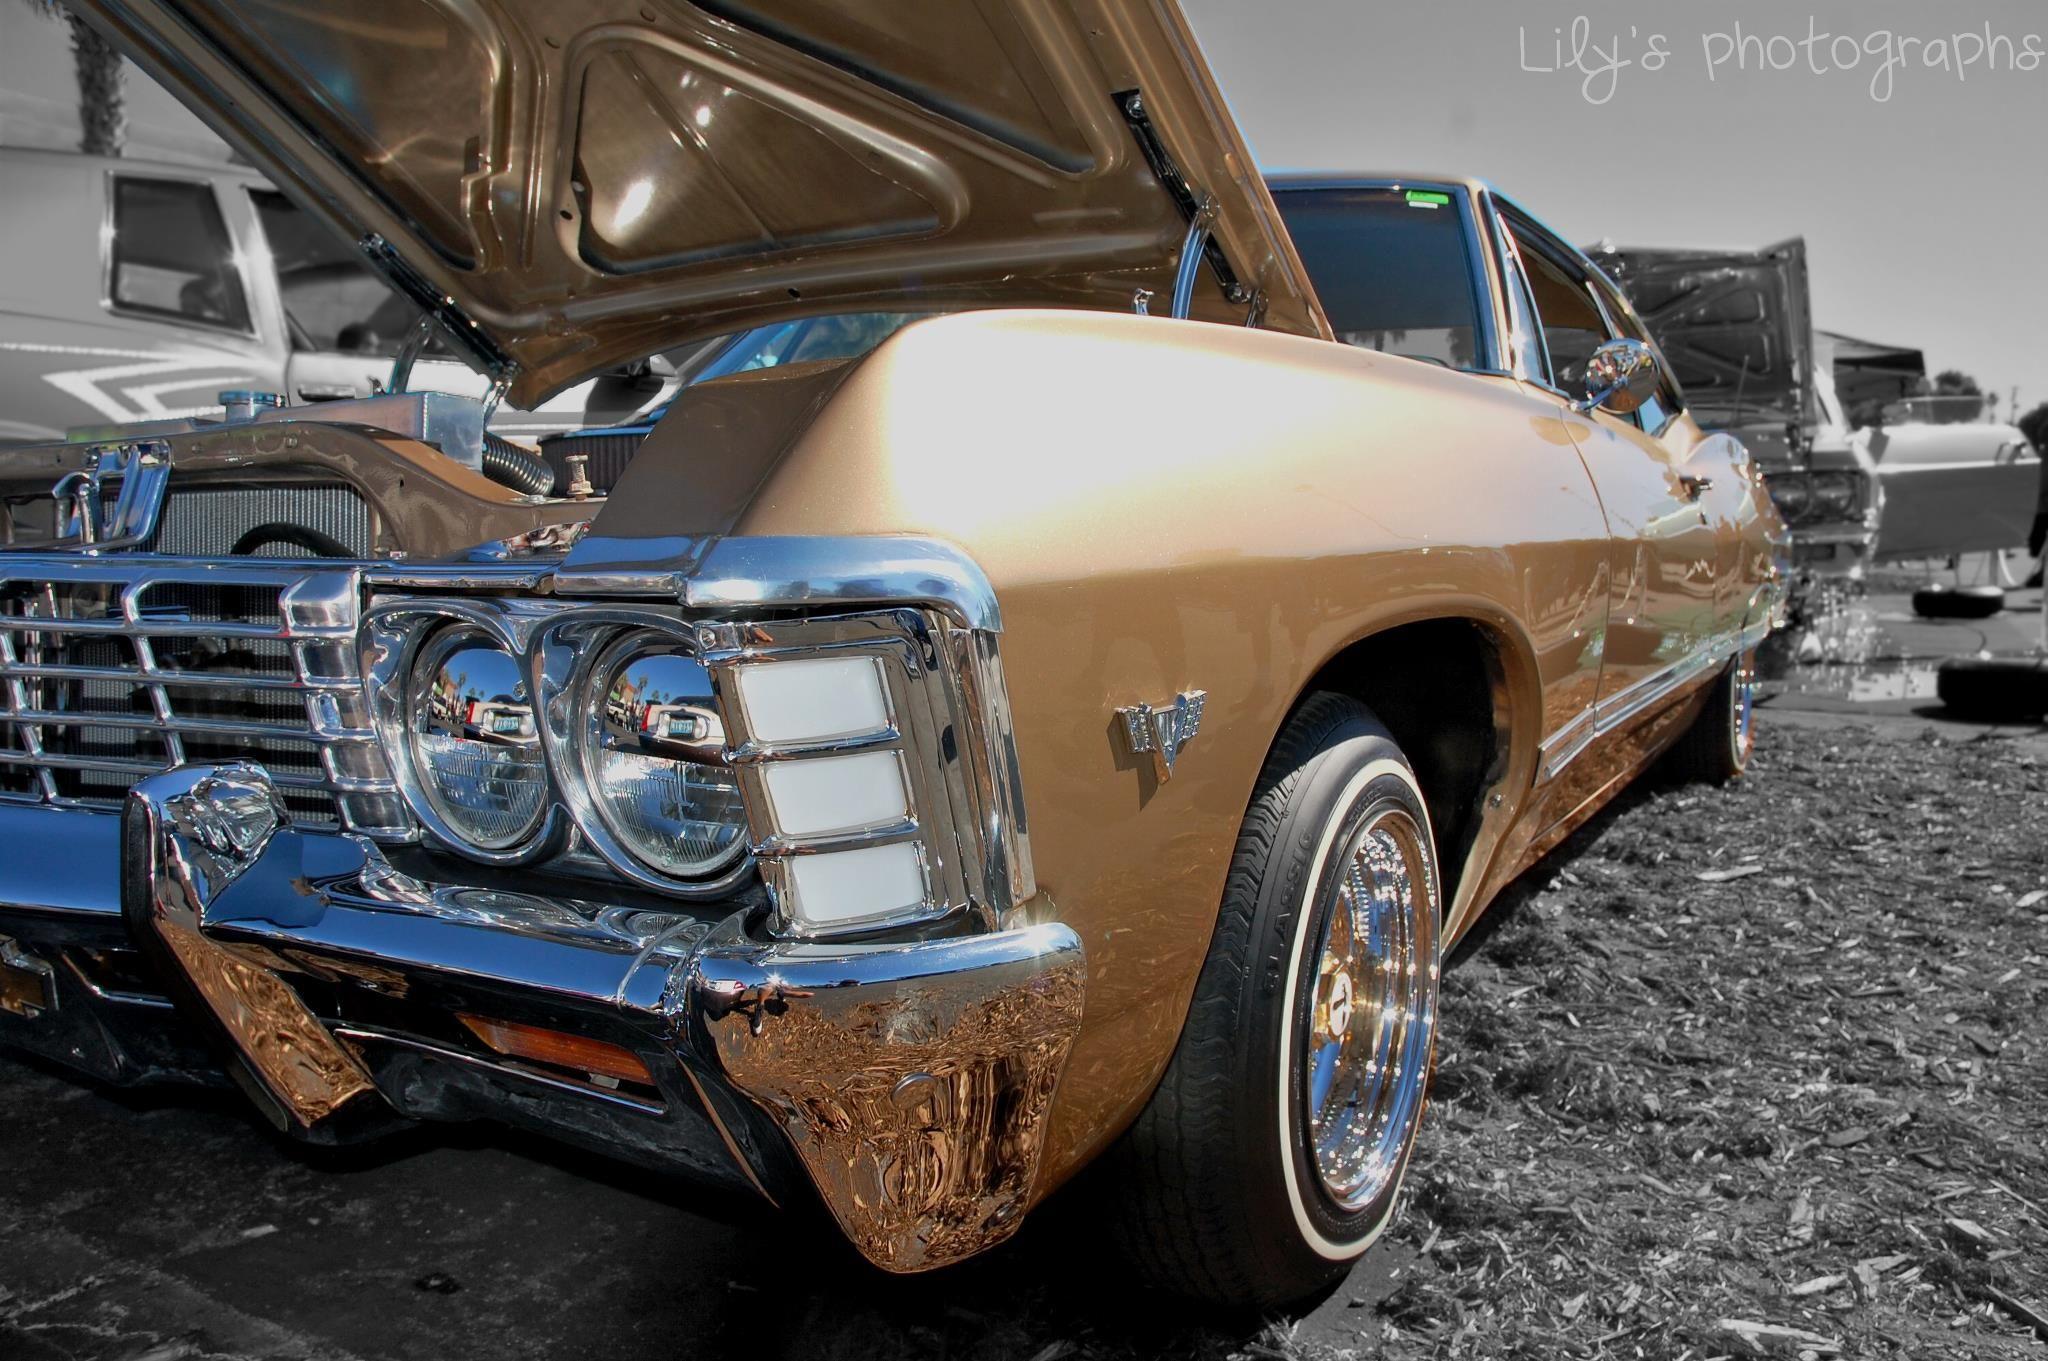 1967 Chevy Impala Taken By Lily S Photographs Las Vegas Nevada